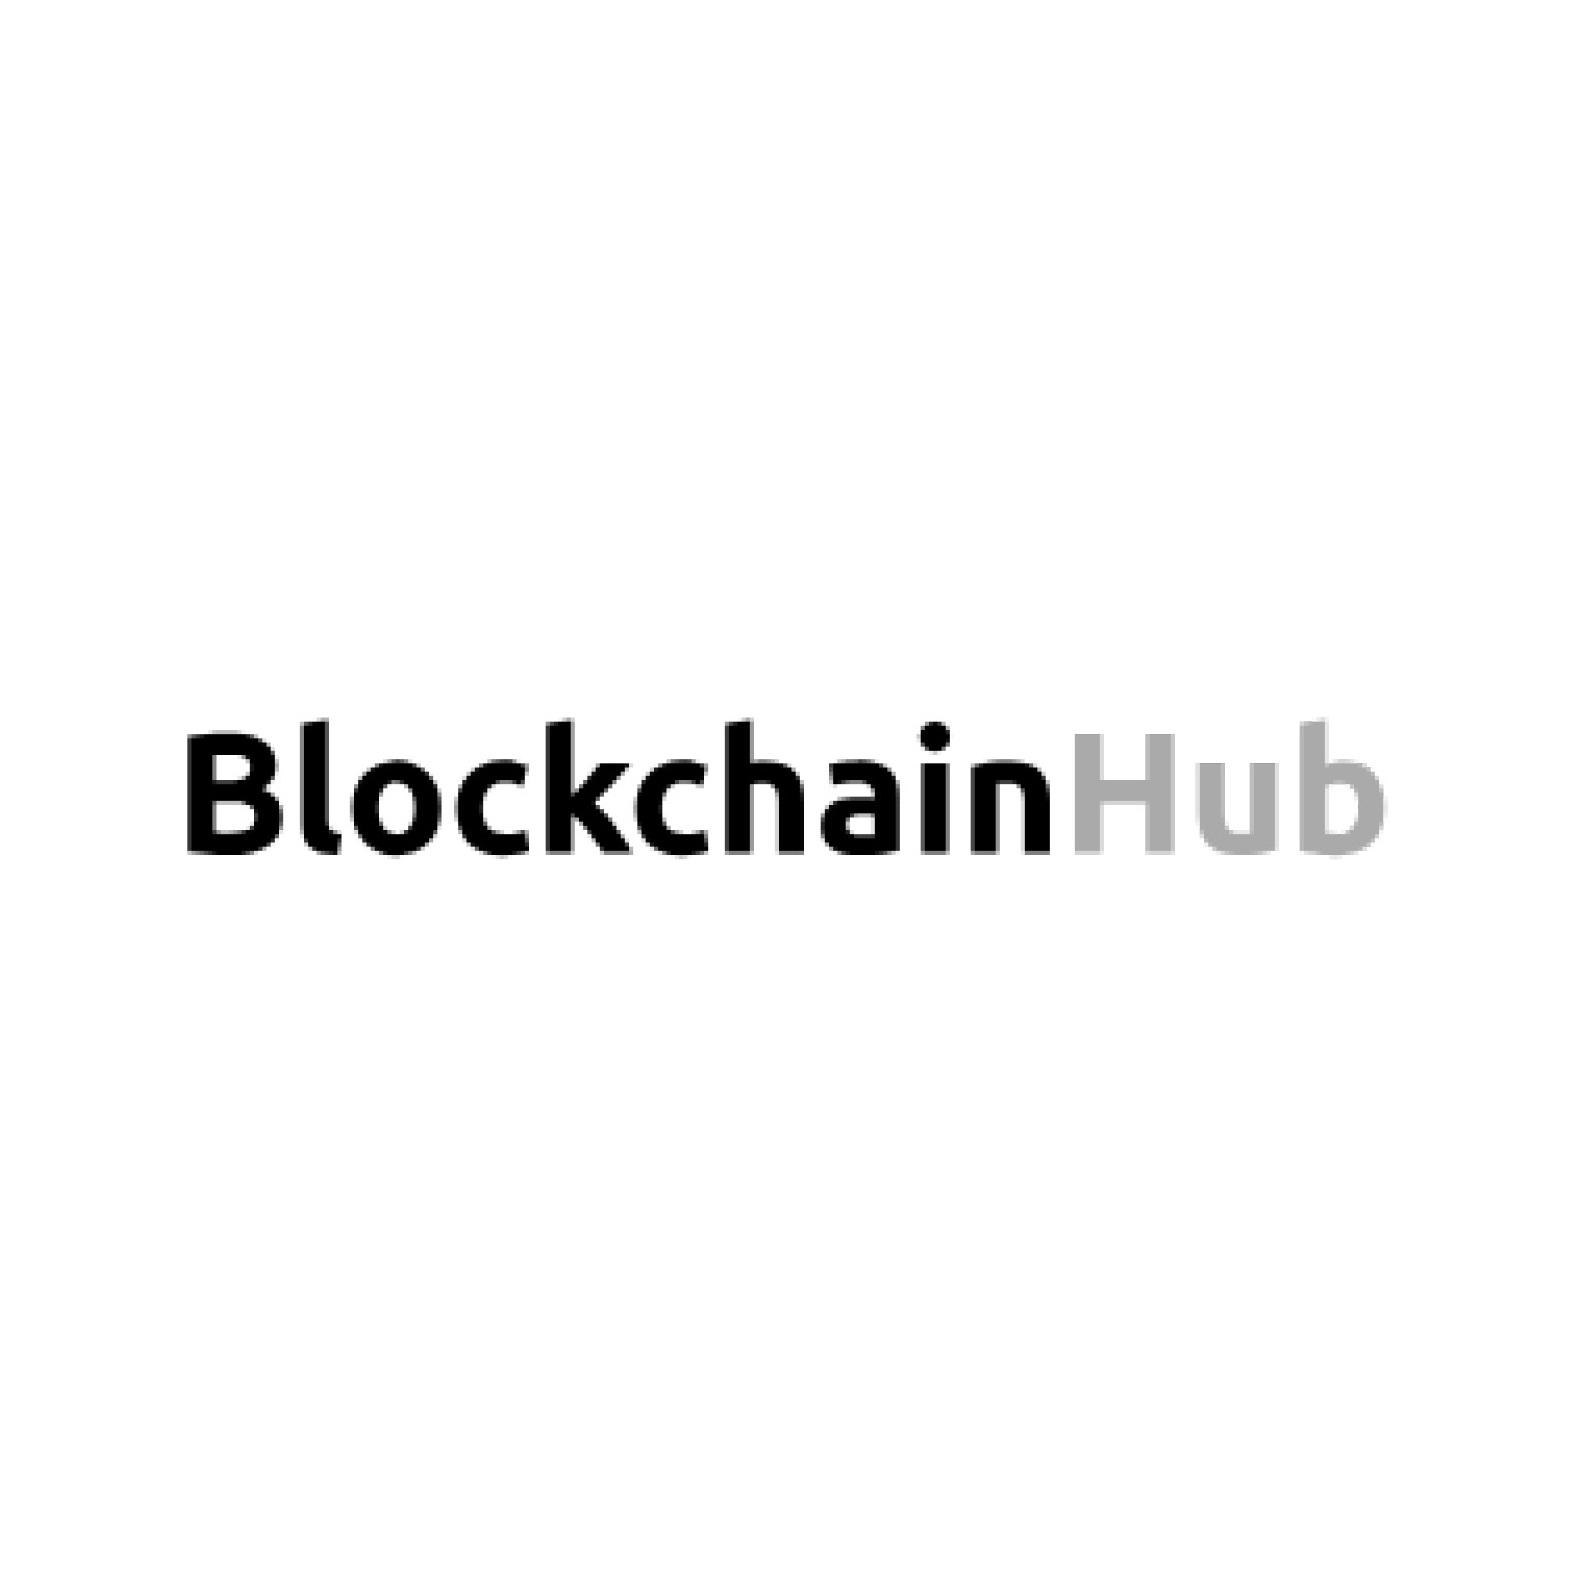 blockchainhub.jpg